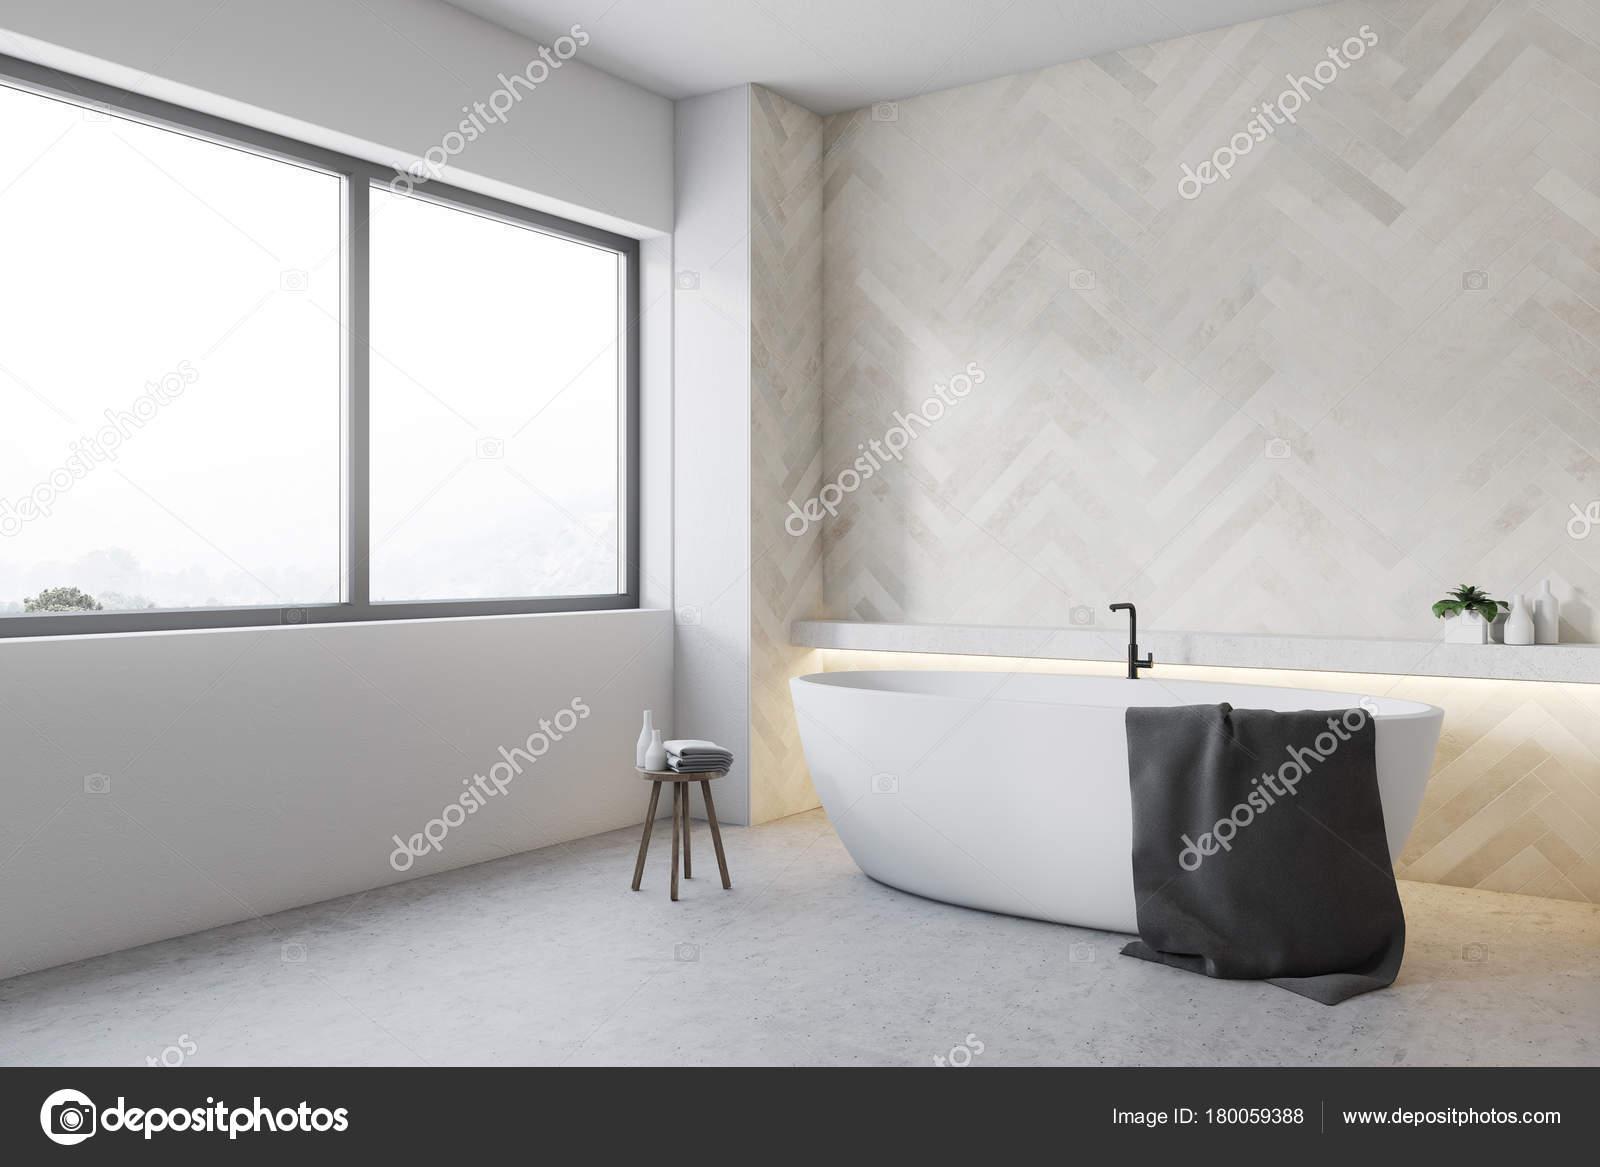 https://st3.depositphotos.com/2673929/18005/i/1600/depositphotos_180059388-stockafbeelding-witte-houten-badkamer-hoek-ronde.jpg